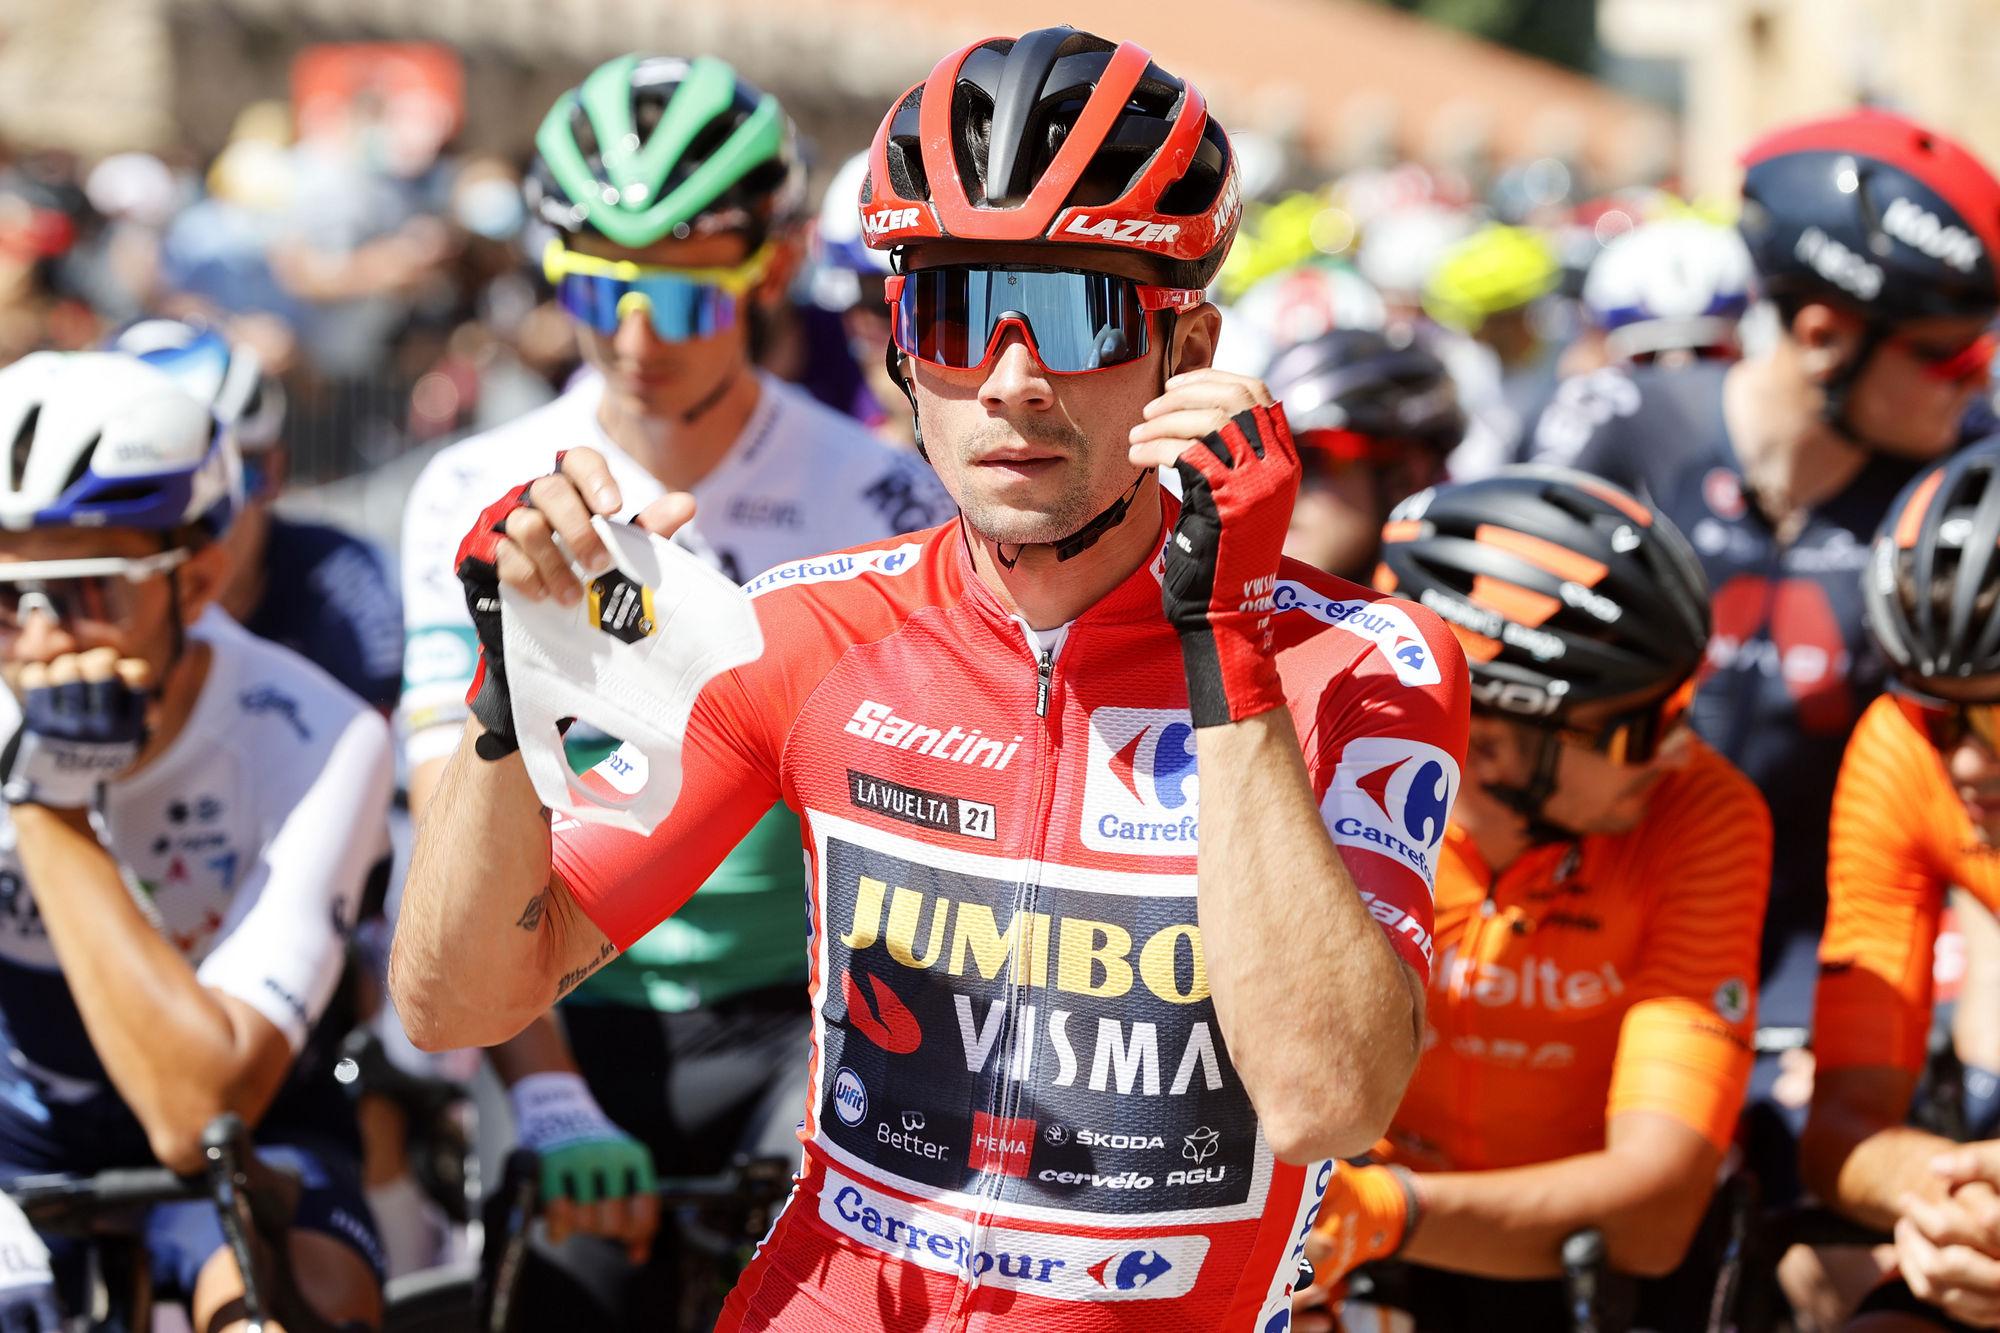 Vuelta a Espana race leader Primoz Roglic (Jumbo-Visma)